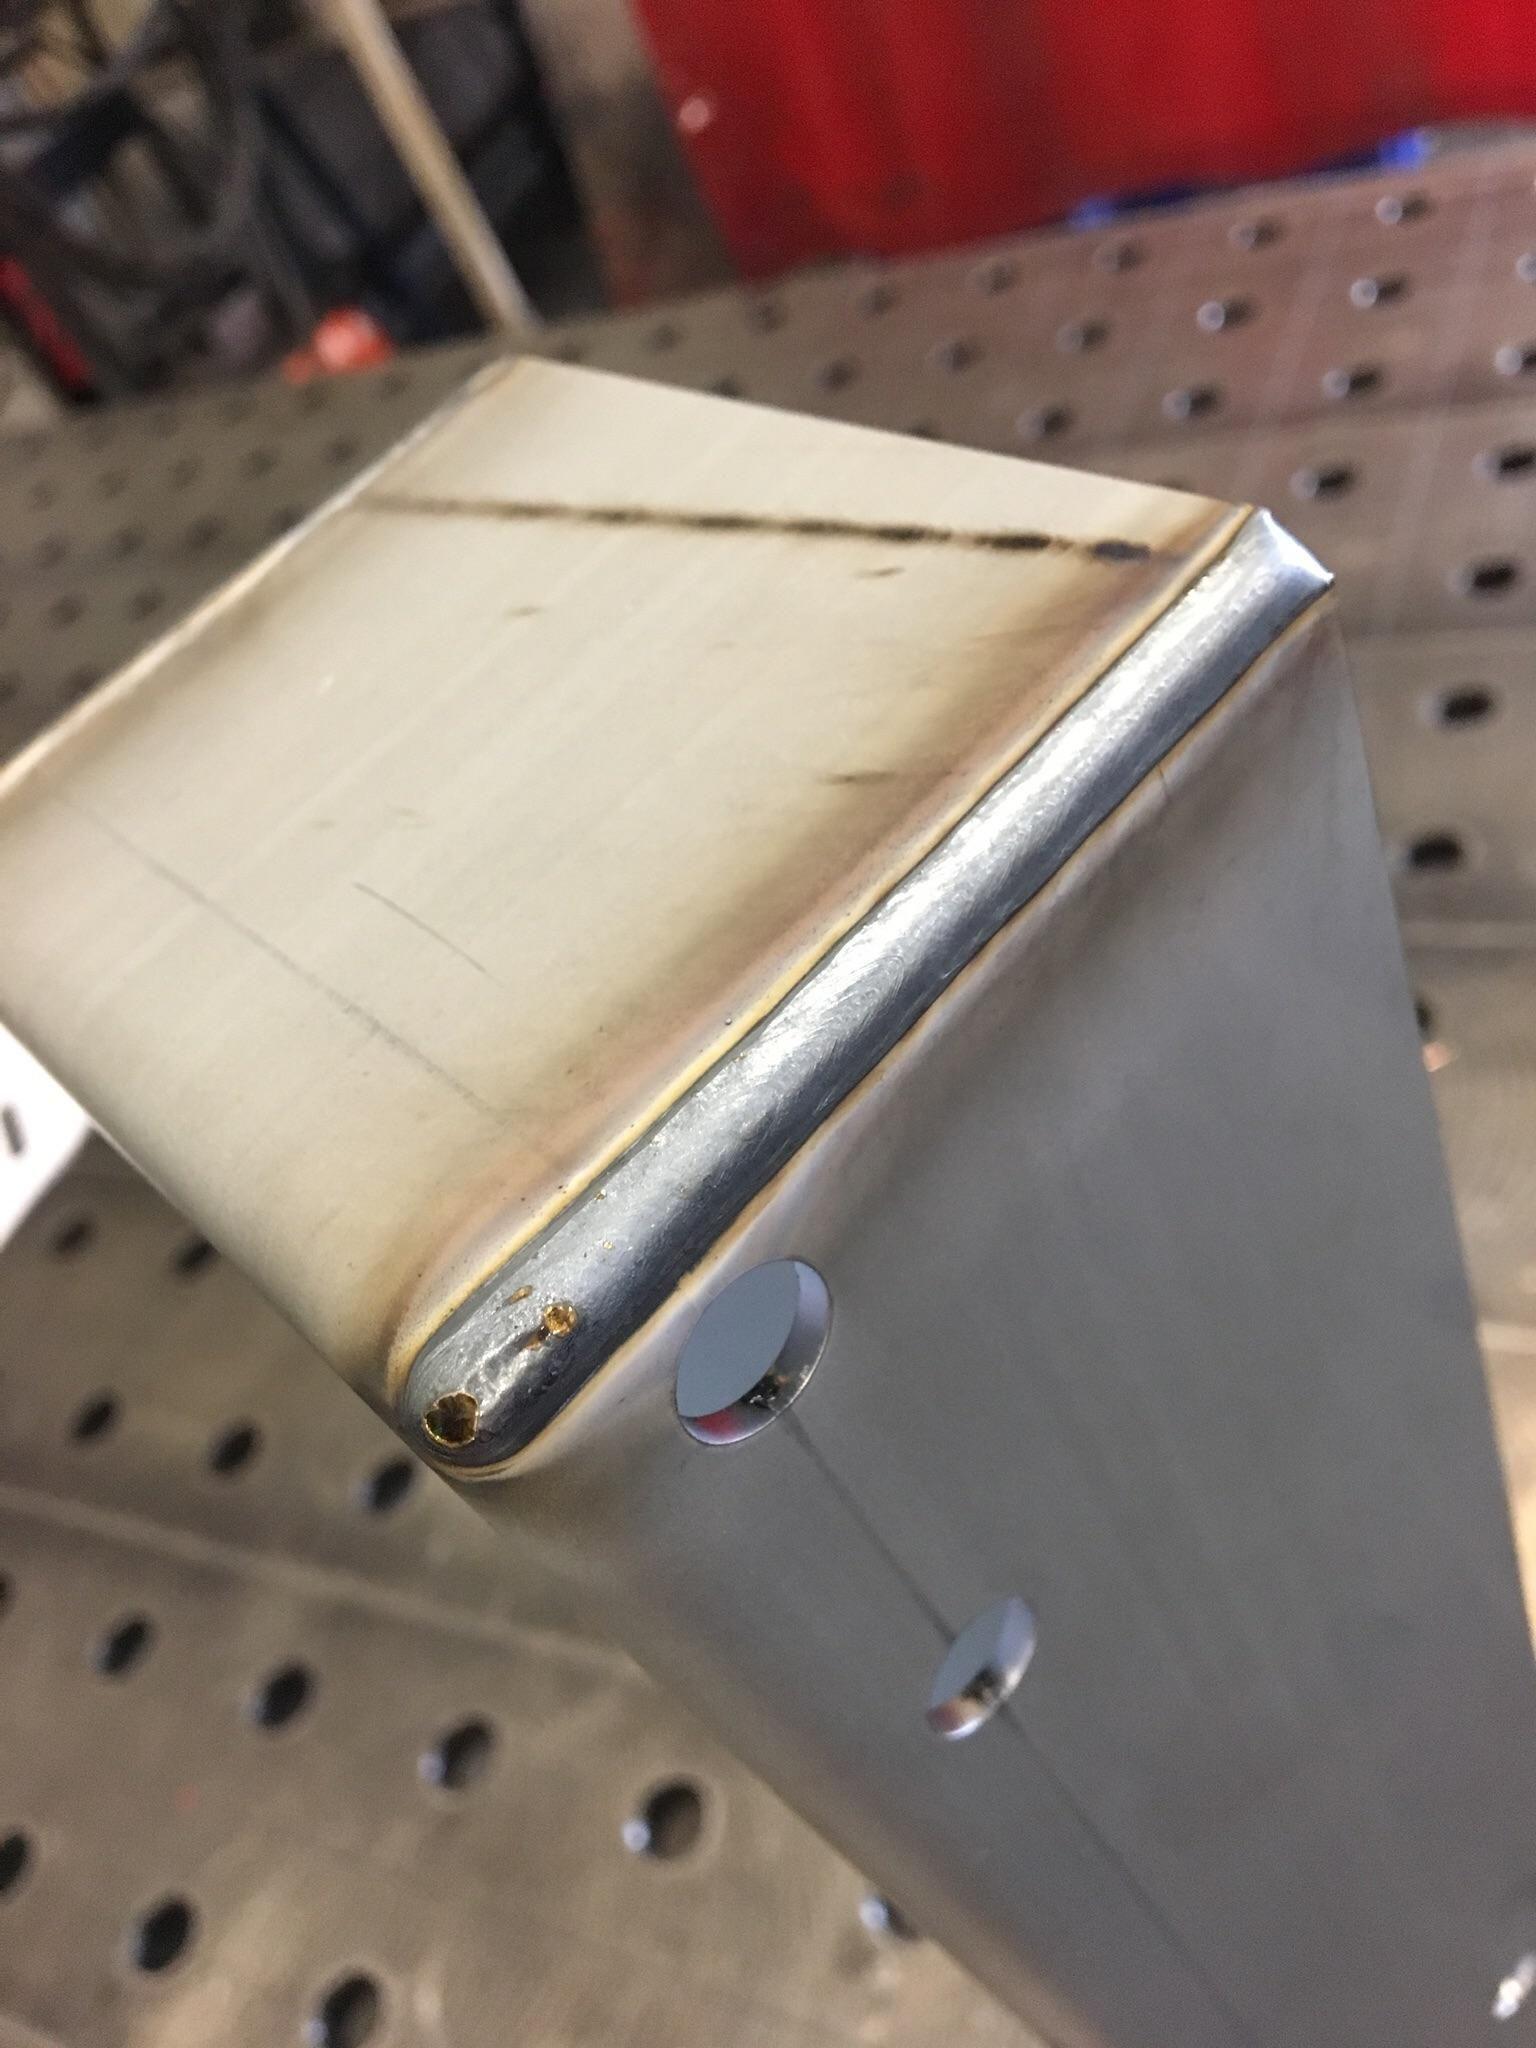 The Prettiest Mig Weld I Ever Managed To Do On Galvanized Steel Metal Welding Metal Shop Building Welding Crafts